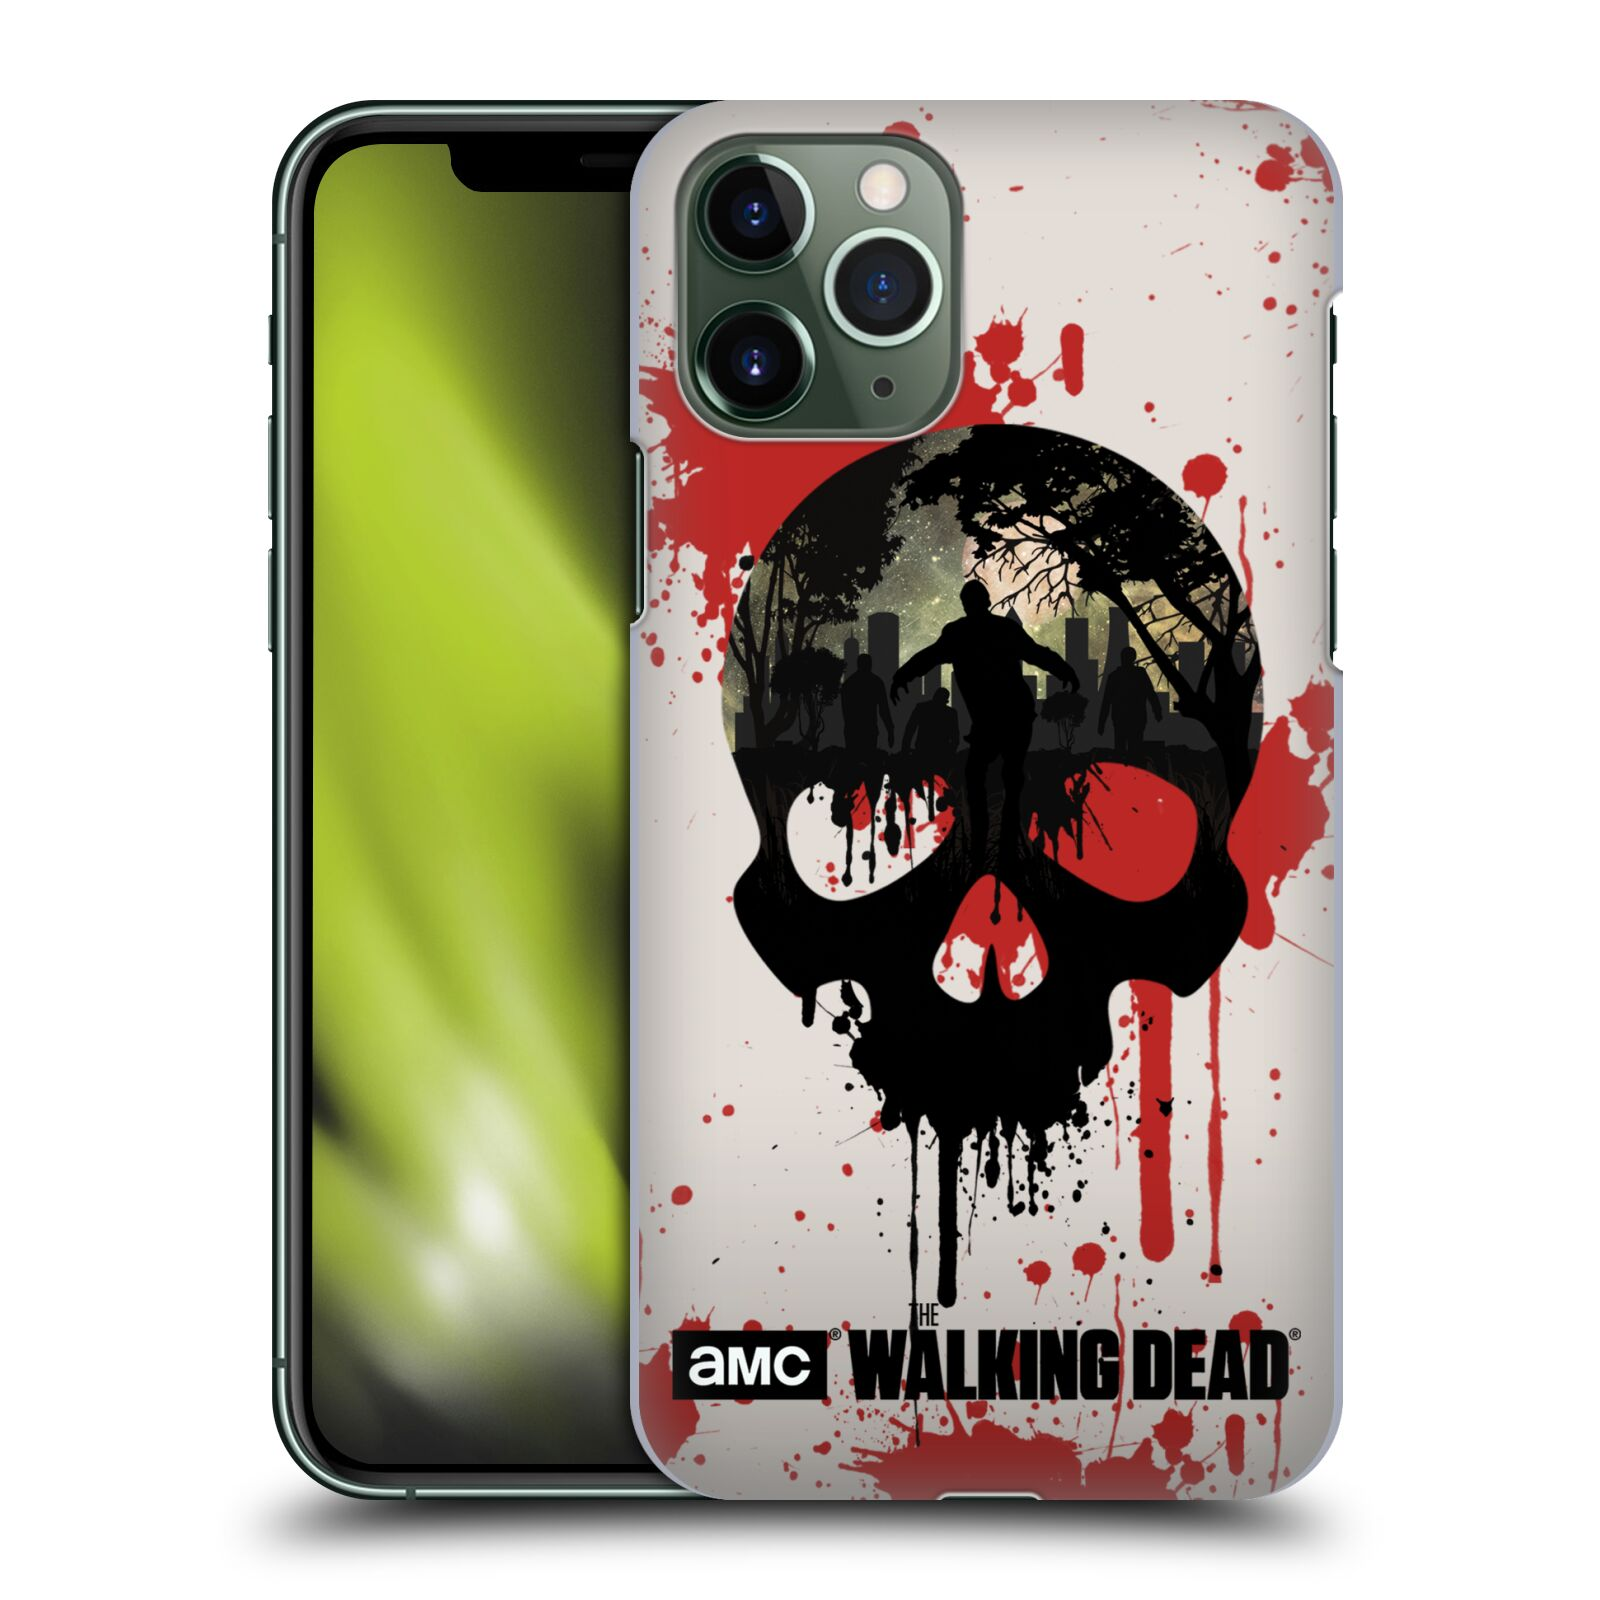 swarovski obaly iphone 6s